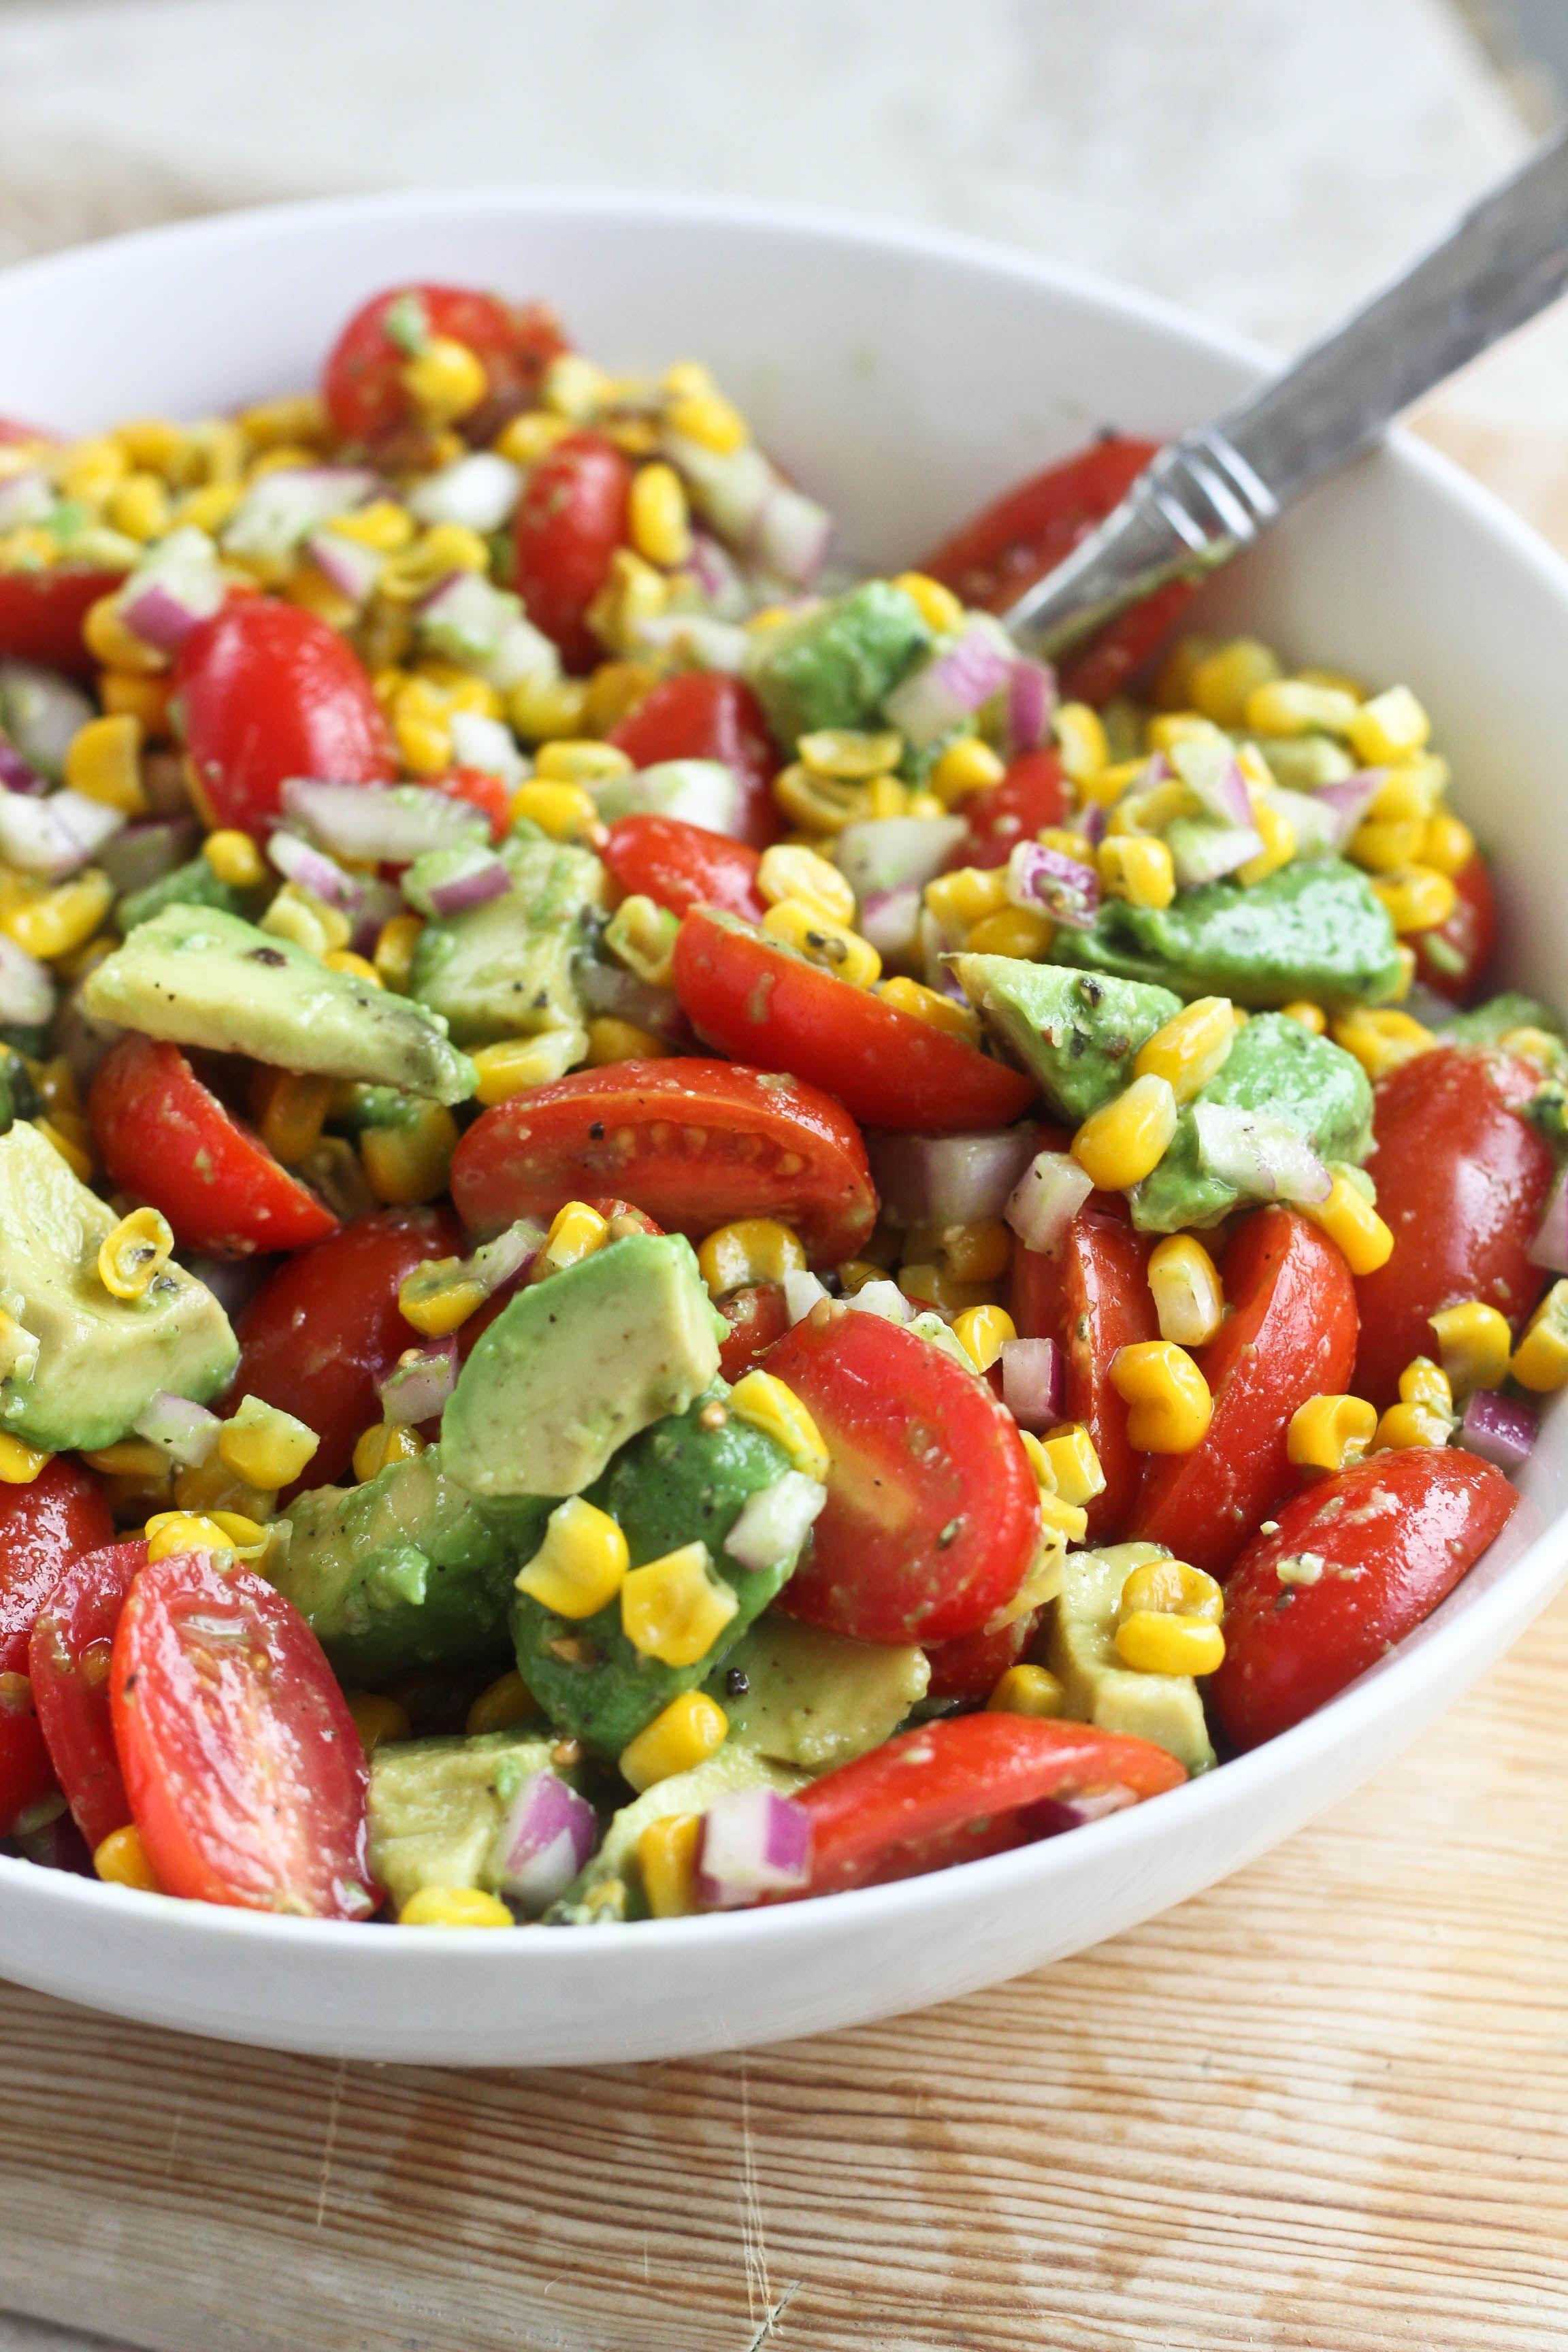 Avocado, Tomato & Corn Salad | Sweet corn, Picnics and Summer